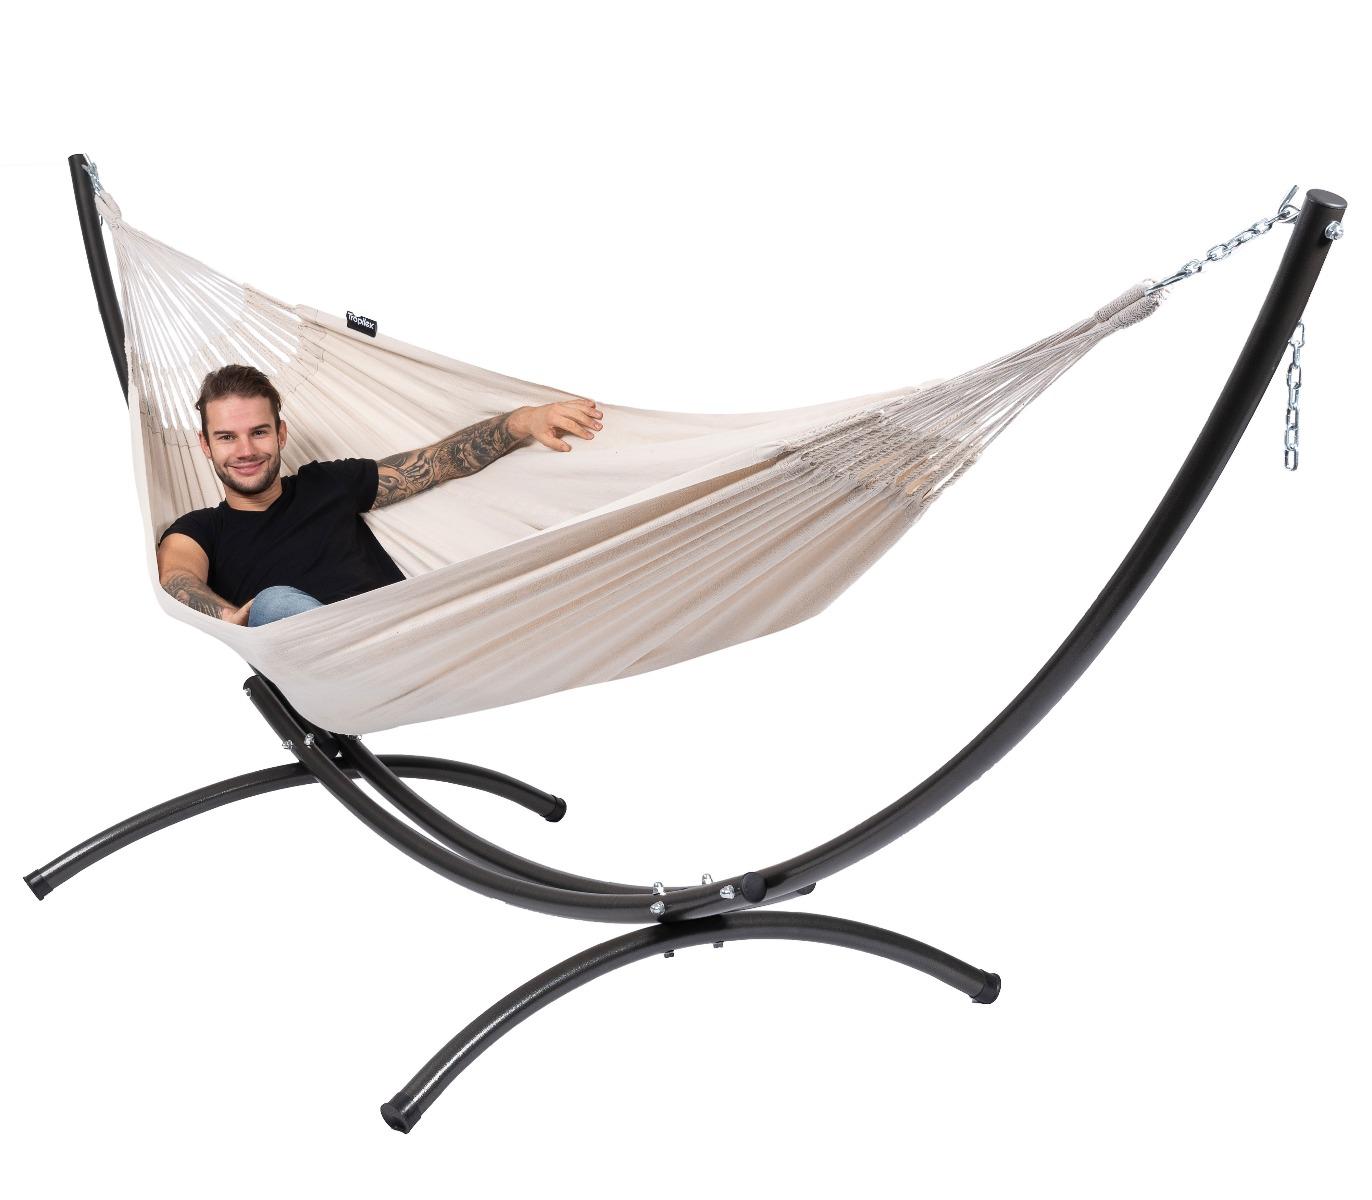 Hangmatset Double 'Arc & Comfort' White - Tropilex ®